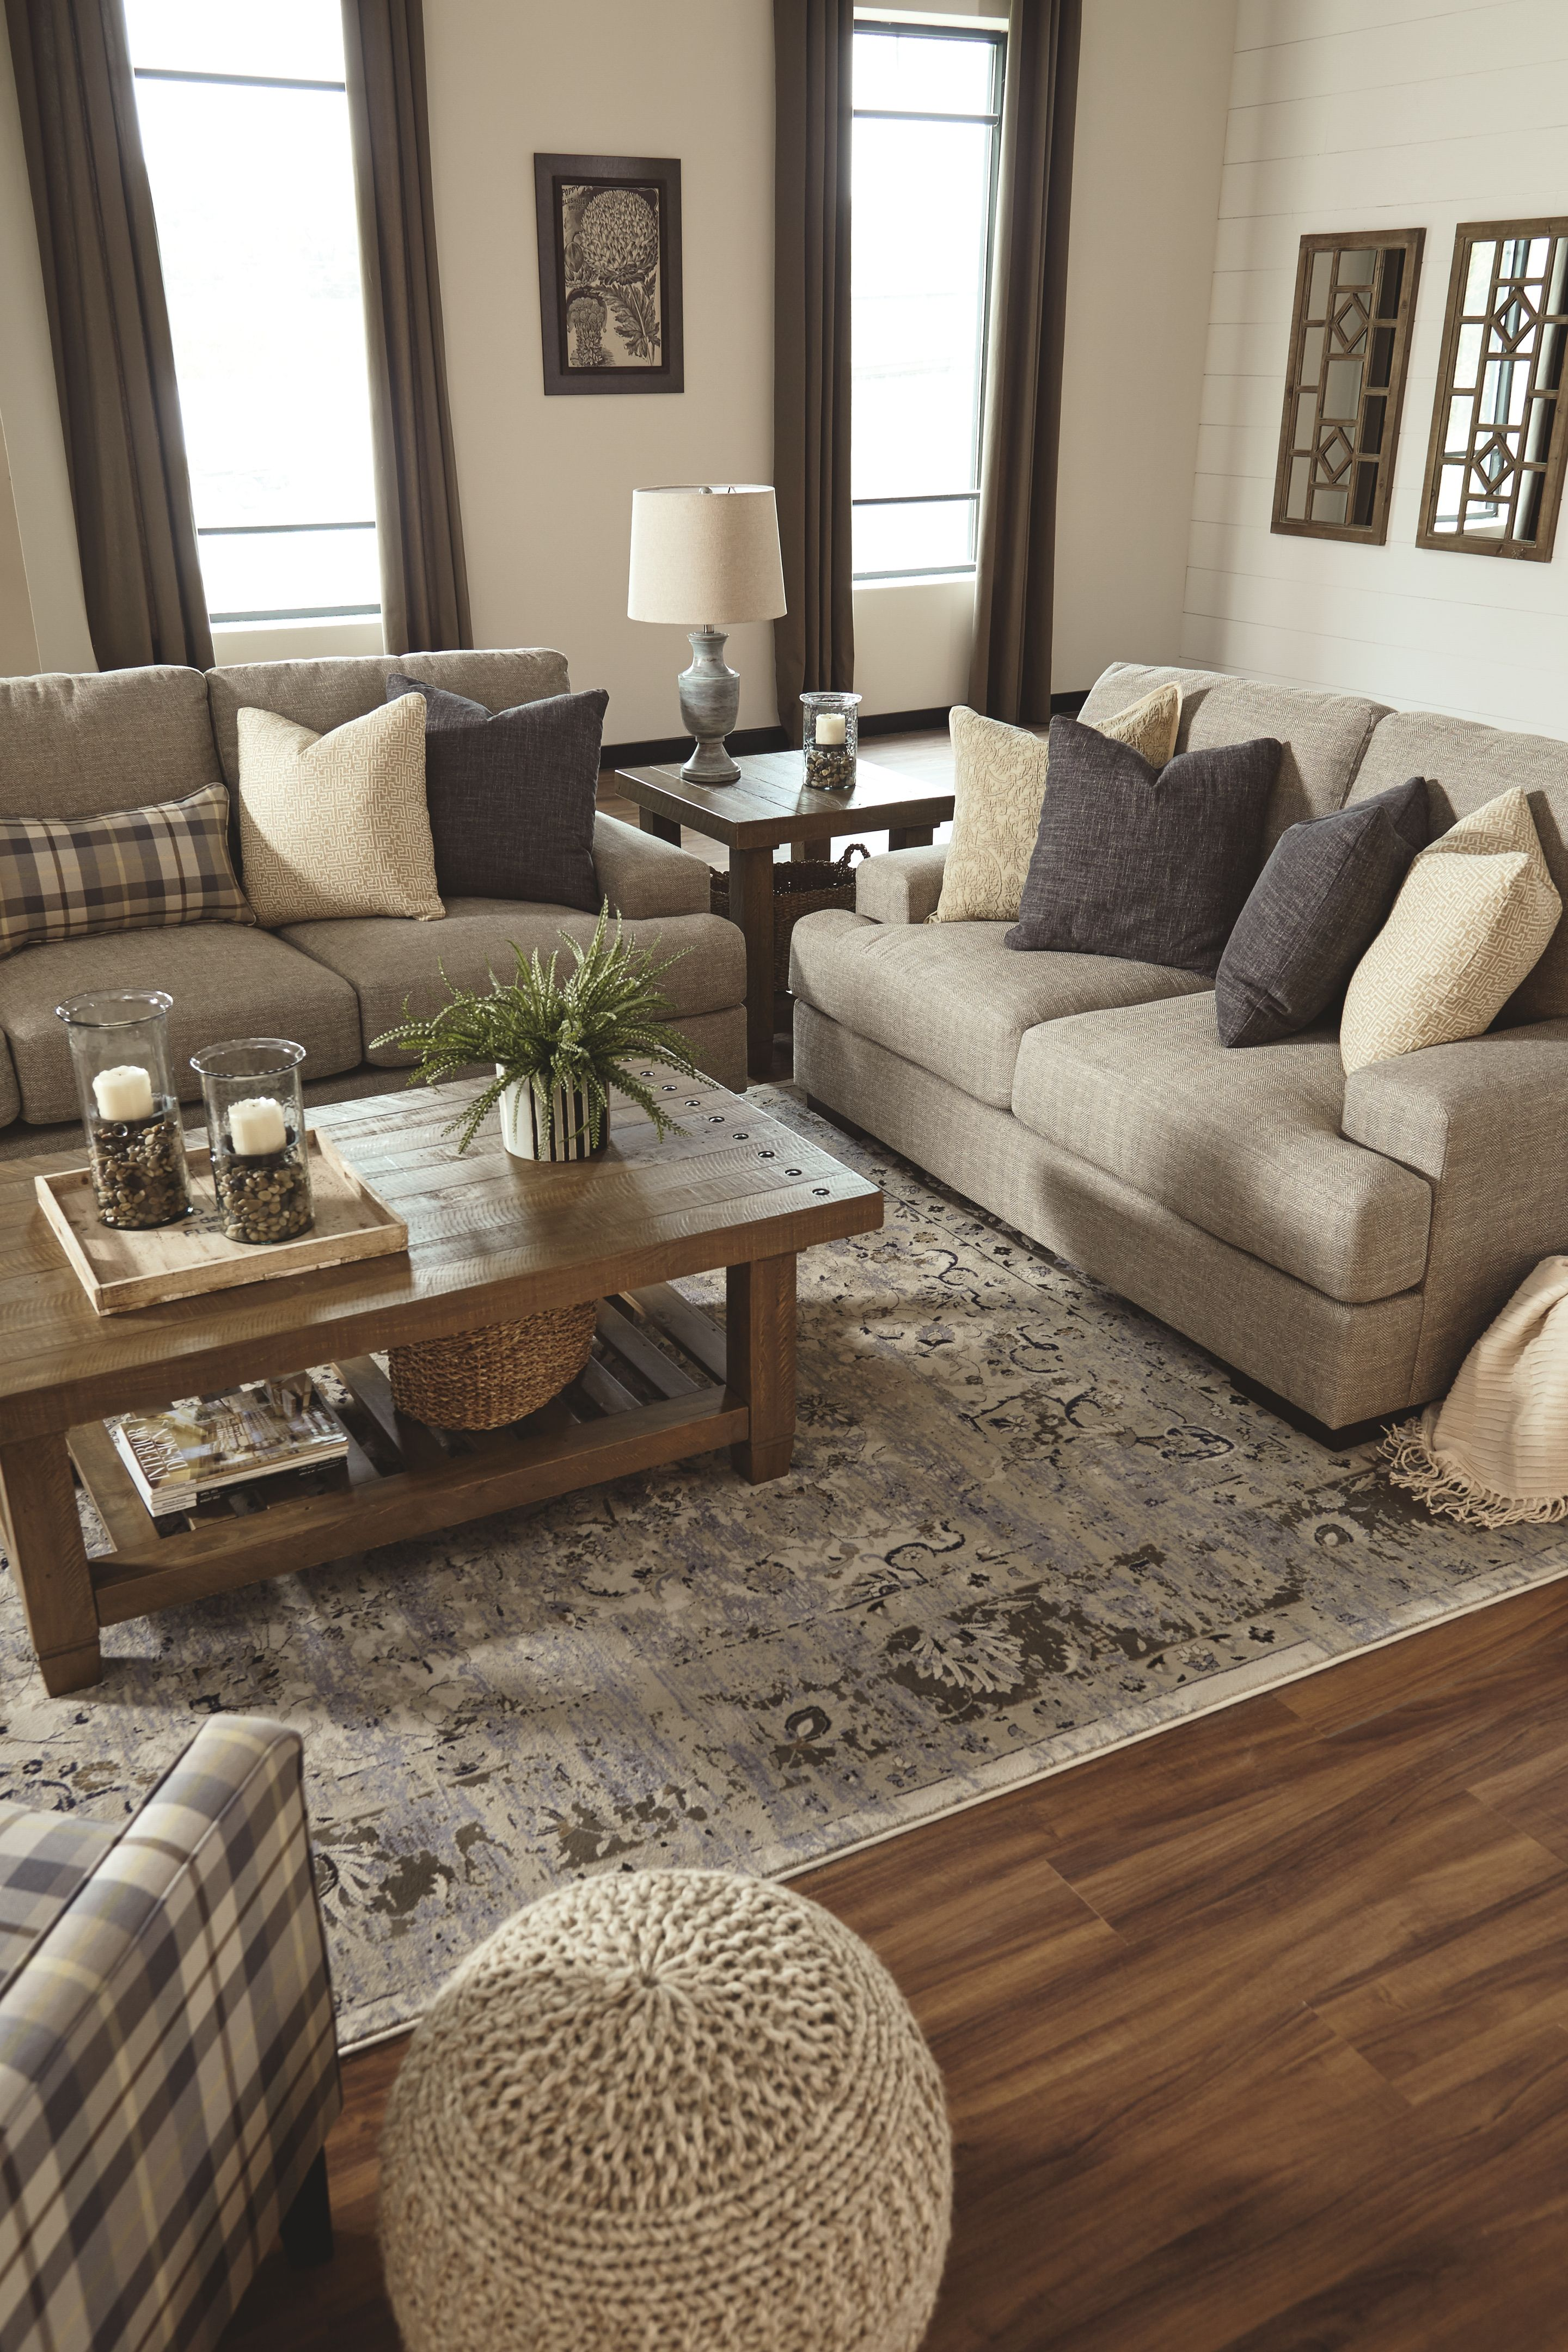 Austwell Sofa images